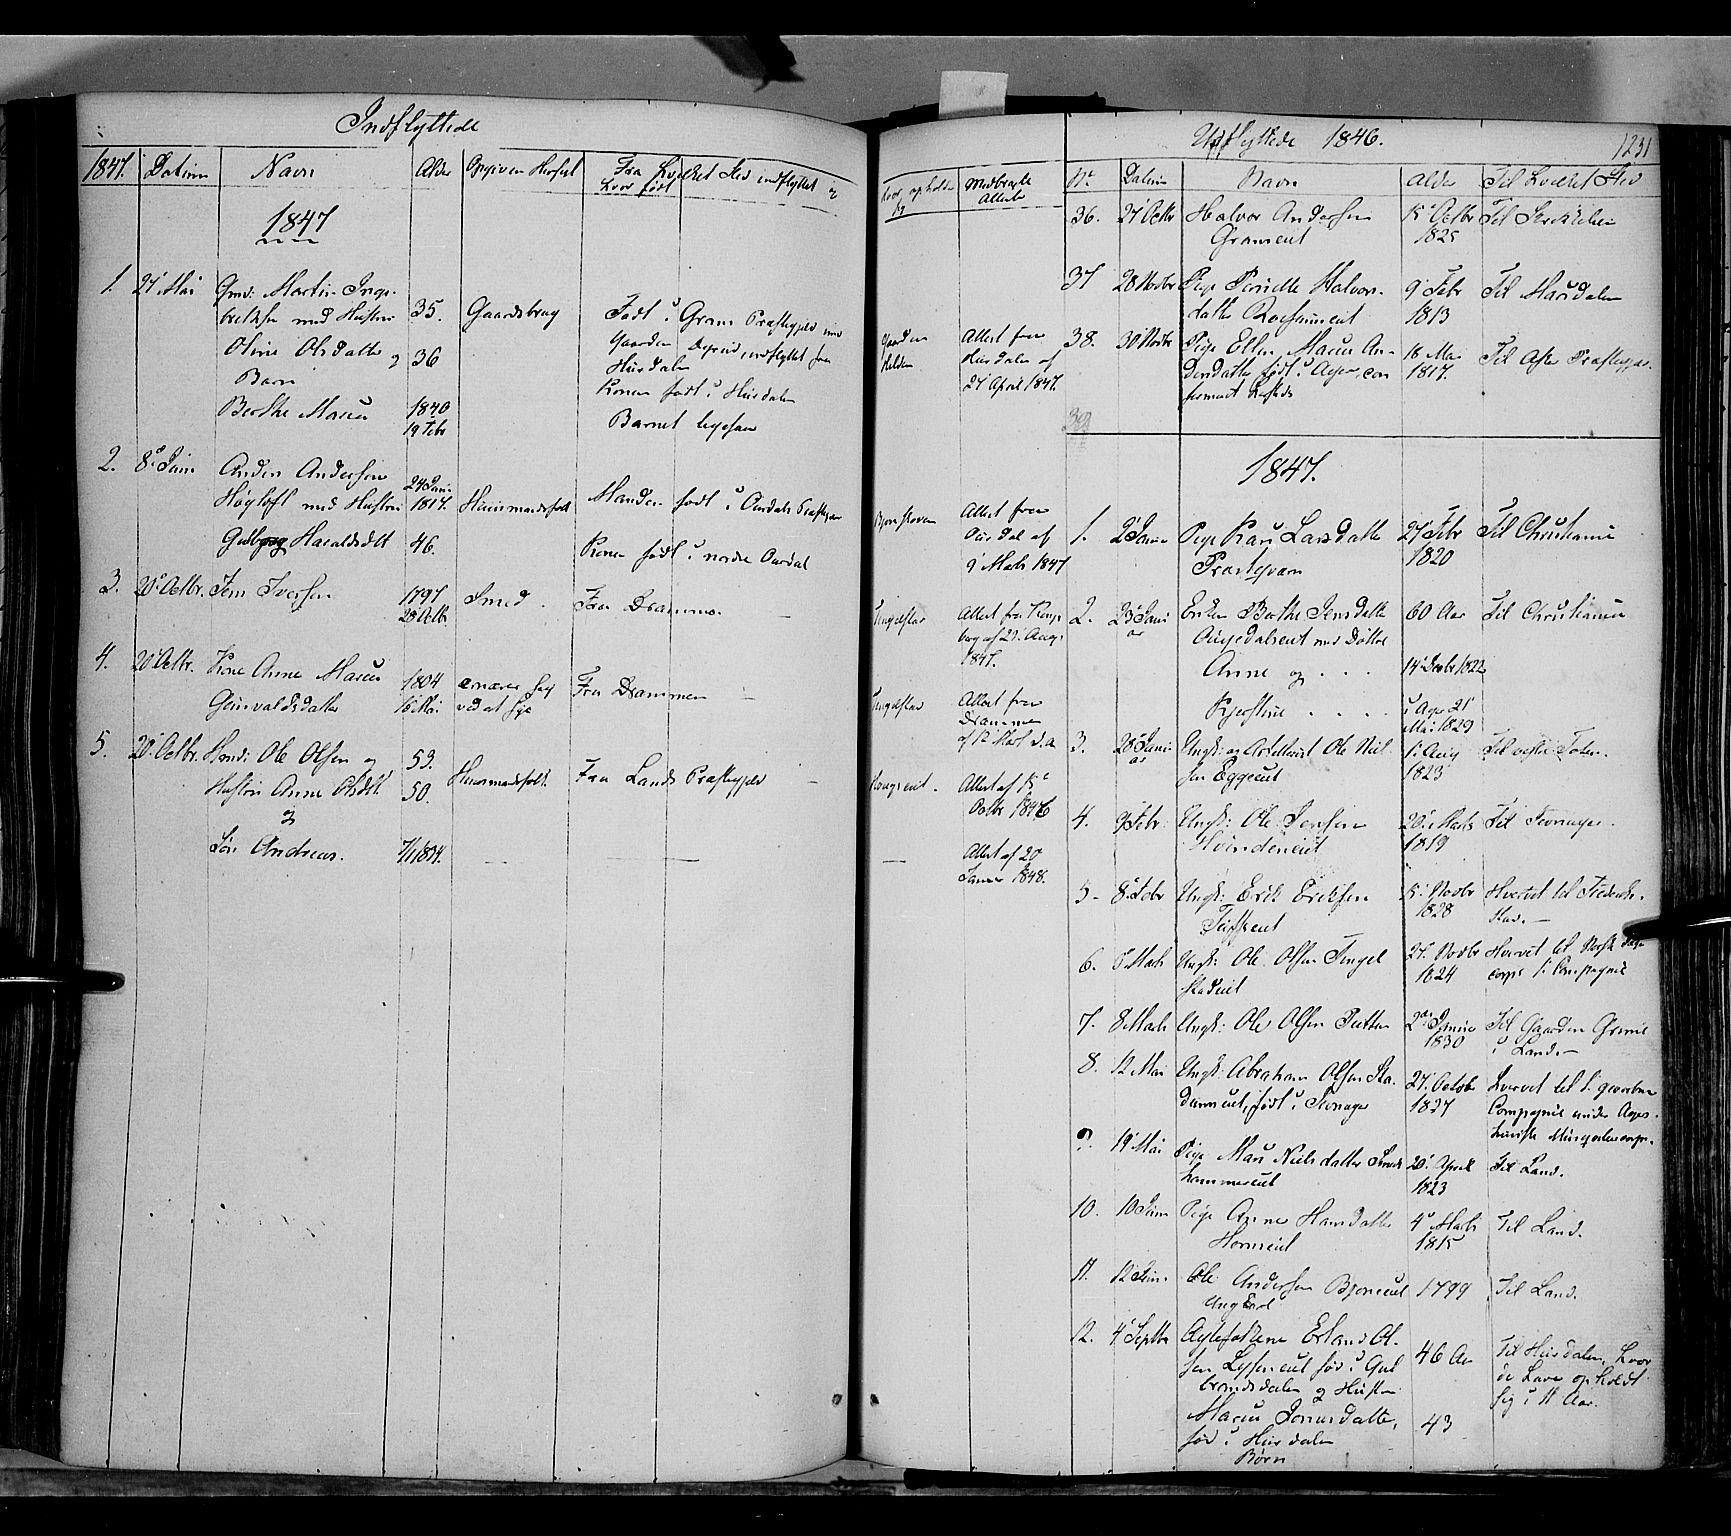 SAH, Gran prestekontor, Ministerialbok nr. 11, 1842-1856, s. 1230-1231